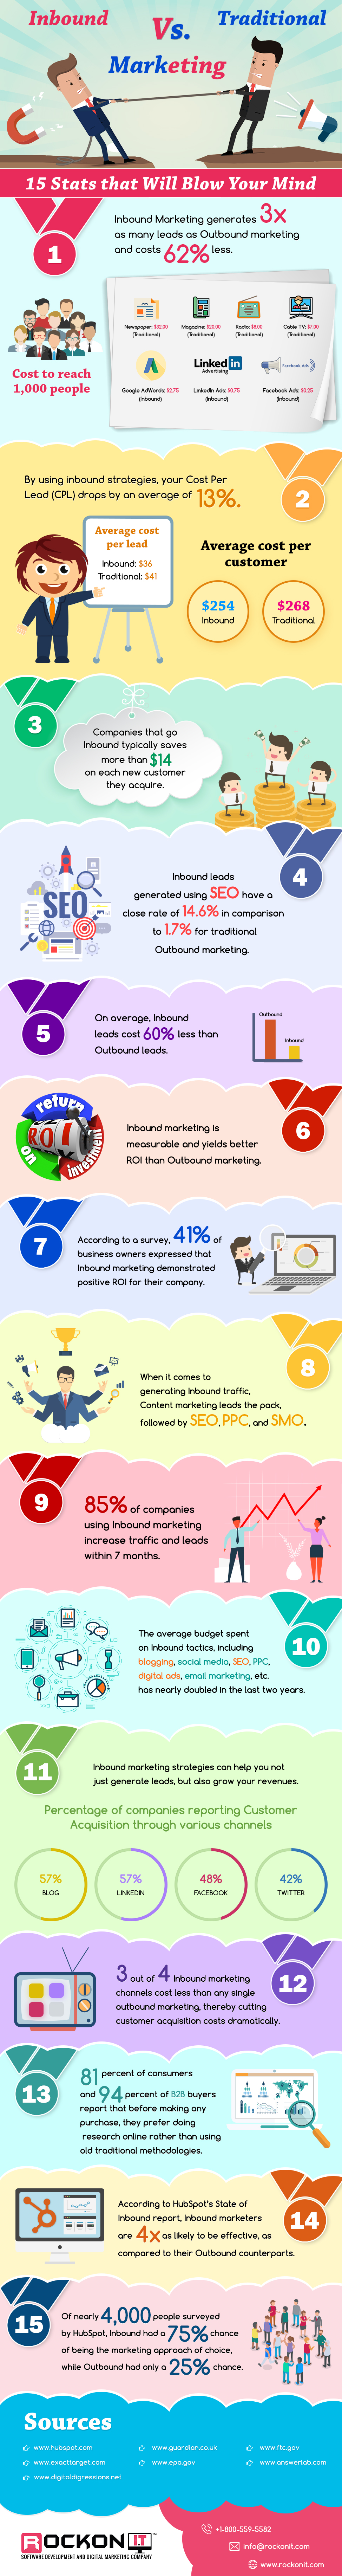 Infographic - inbound marketing vs traditional marketing